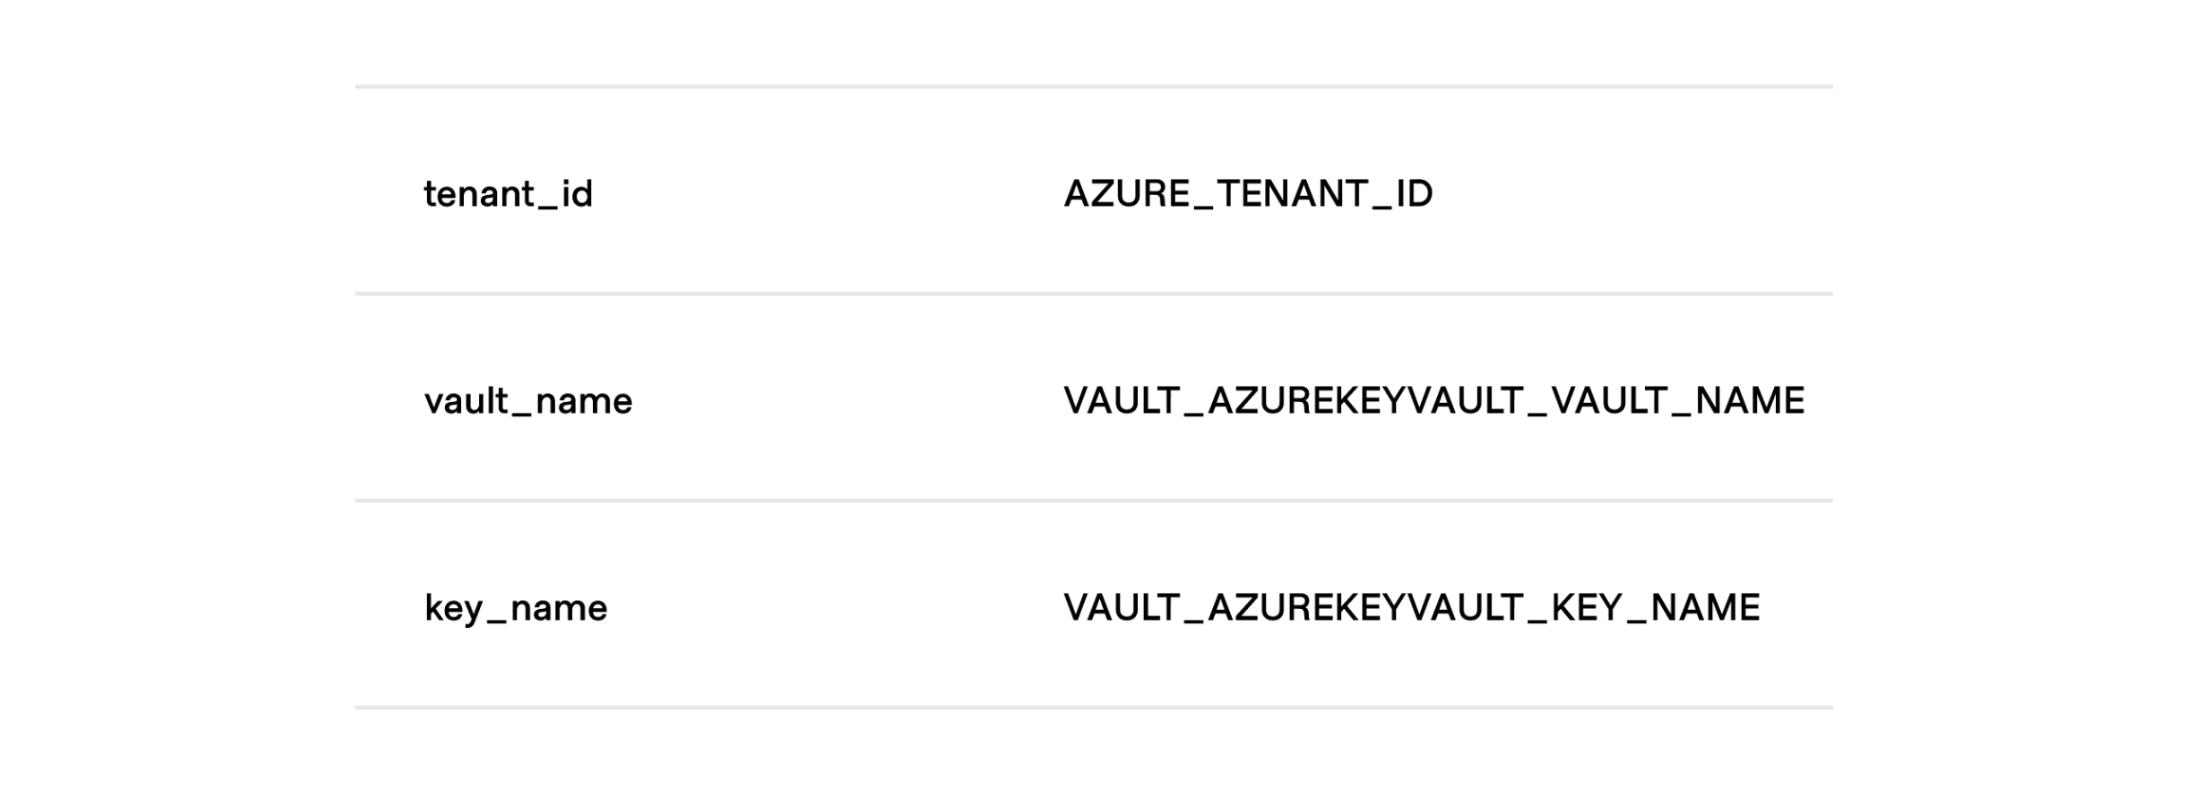 tenant_id = AZURE_TENANT_ID, vault_name = VAULT_AZUREKEYVAULT_VAULT_NAME , key_name = VAULT_AZURE_KEYVAULT_KEY_NAME